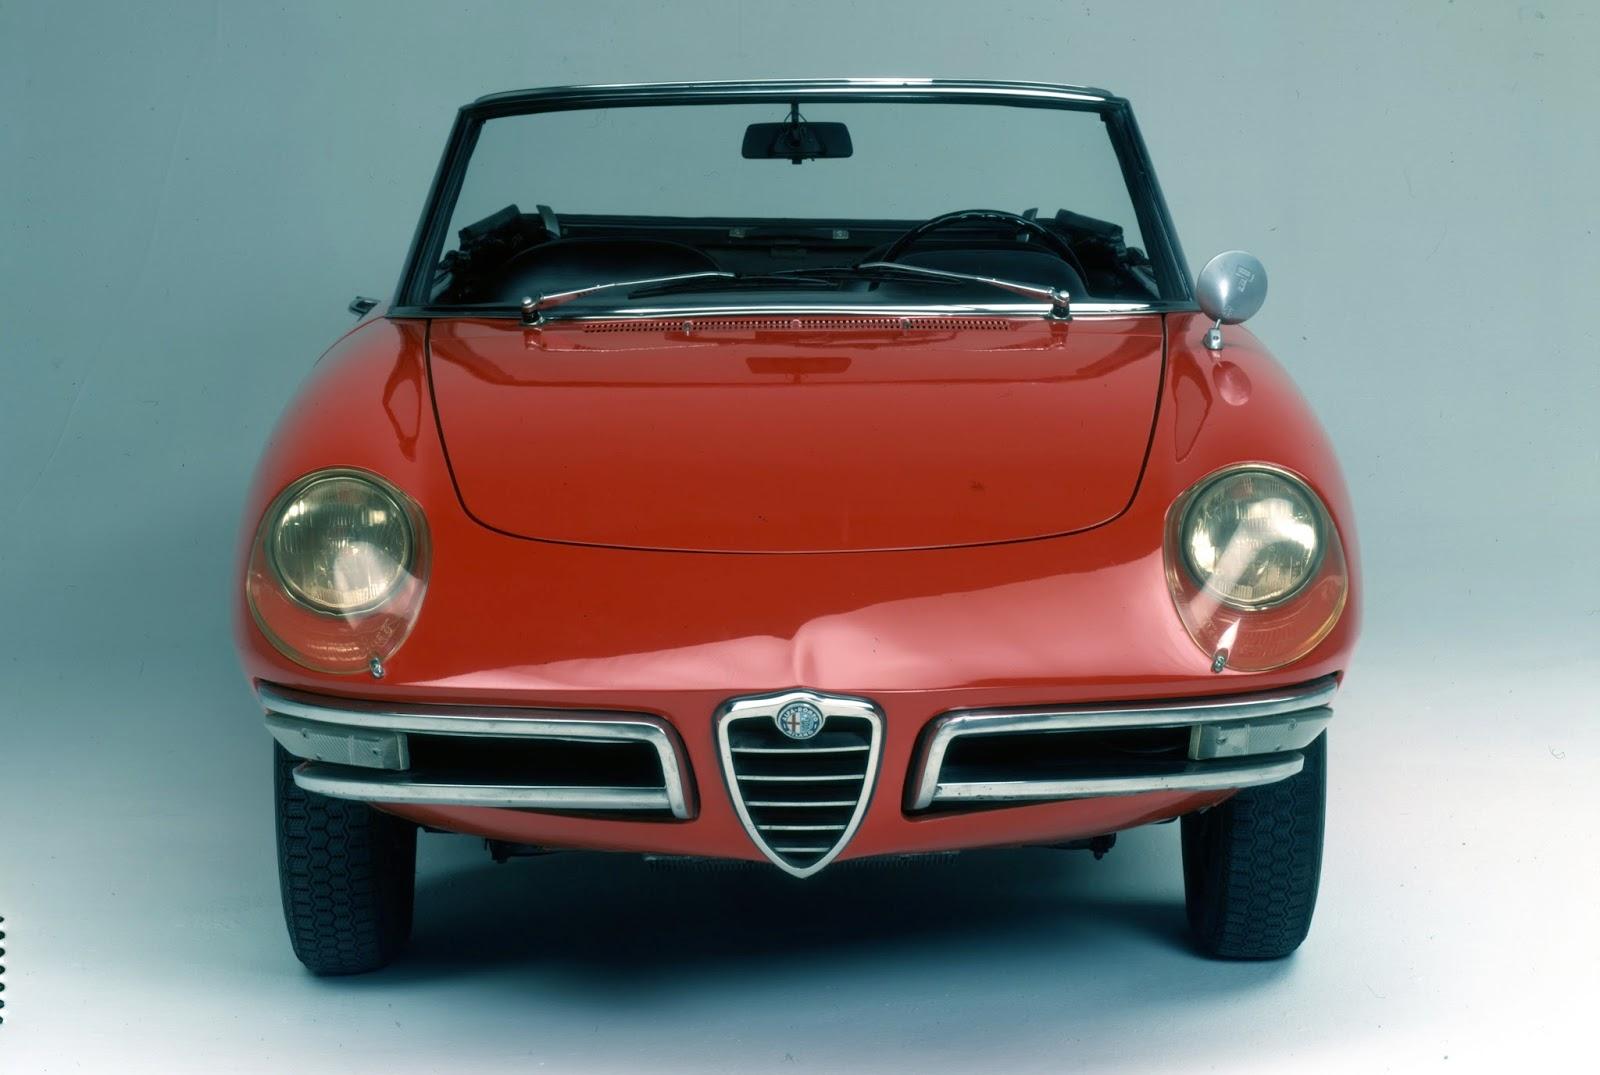 170413 Heritage Targa Florio 07 Τα ιστορικά μοντέλα της FCA επιστρέφουν στο Targa Florio Abarth, alfa romeo, Classic, Fiat, Lancia